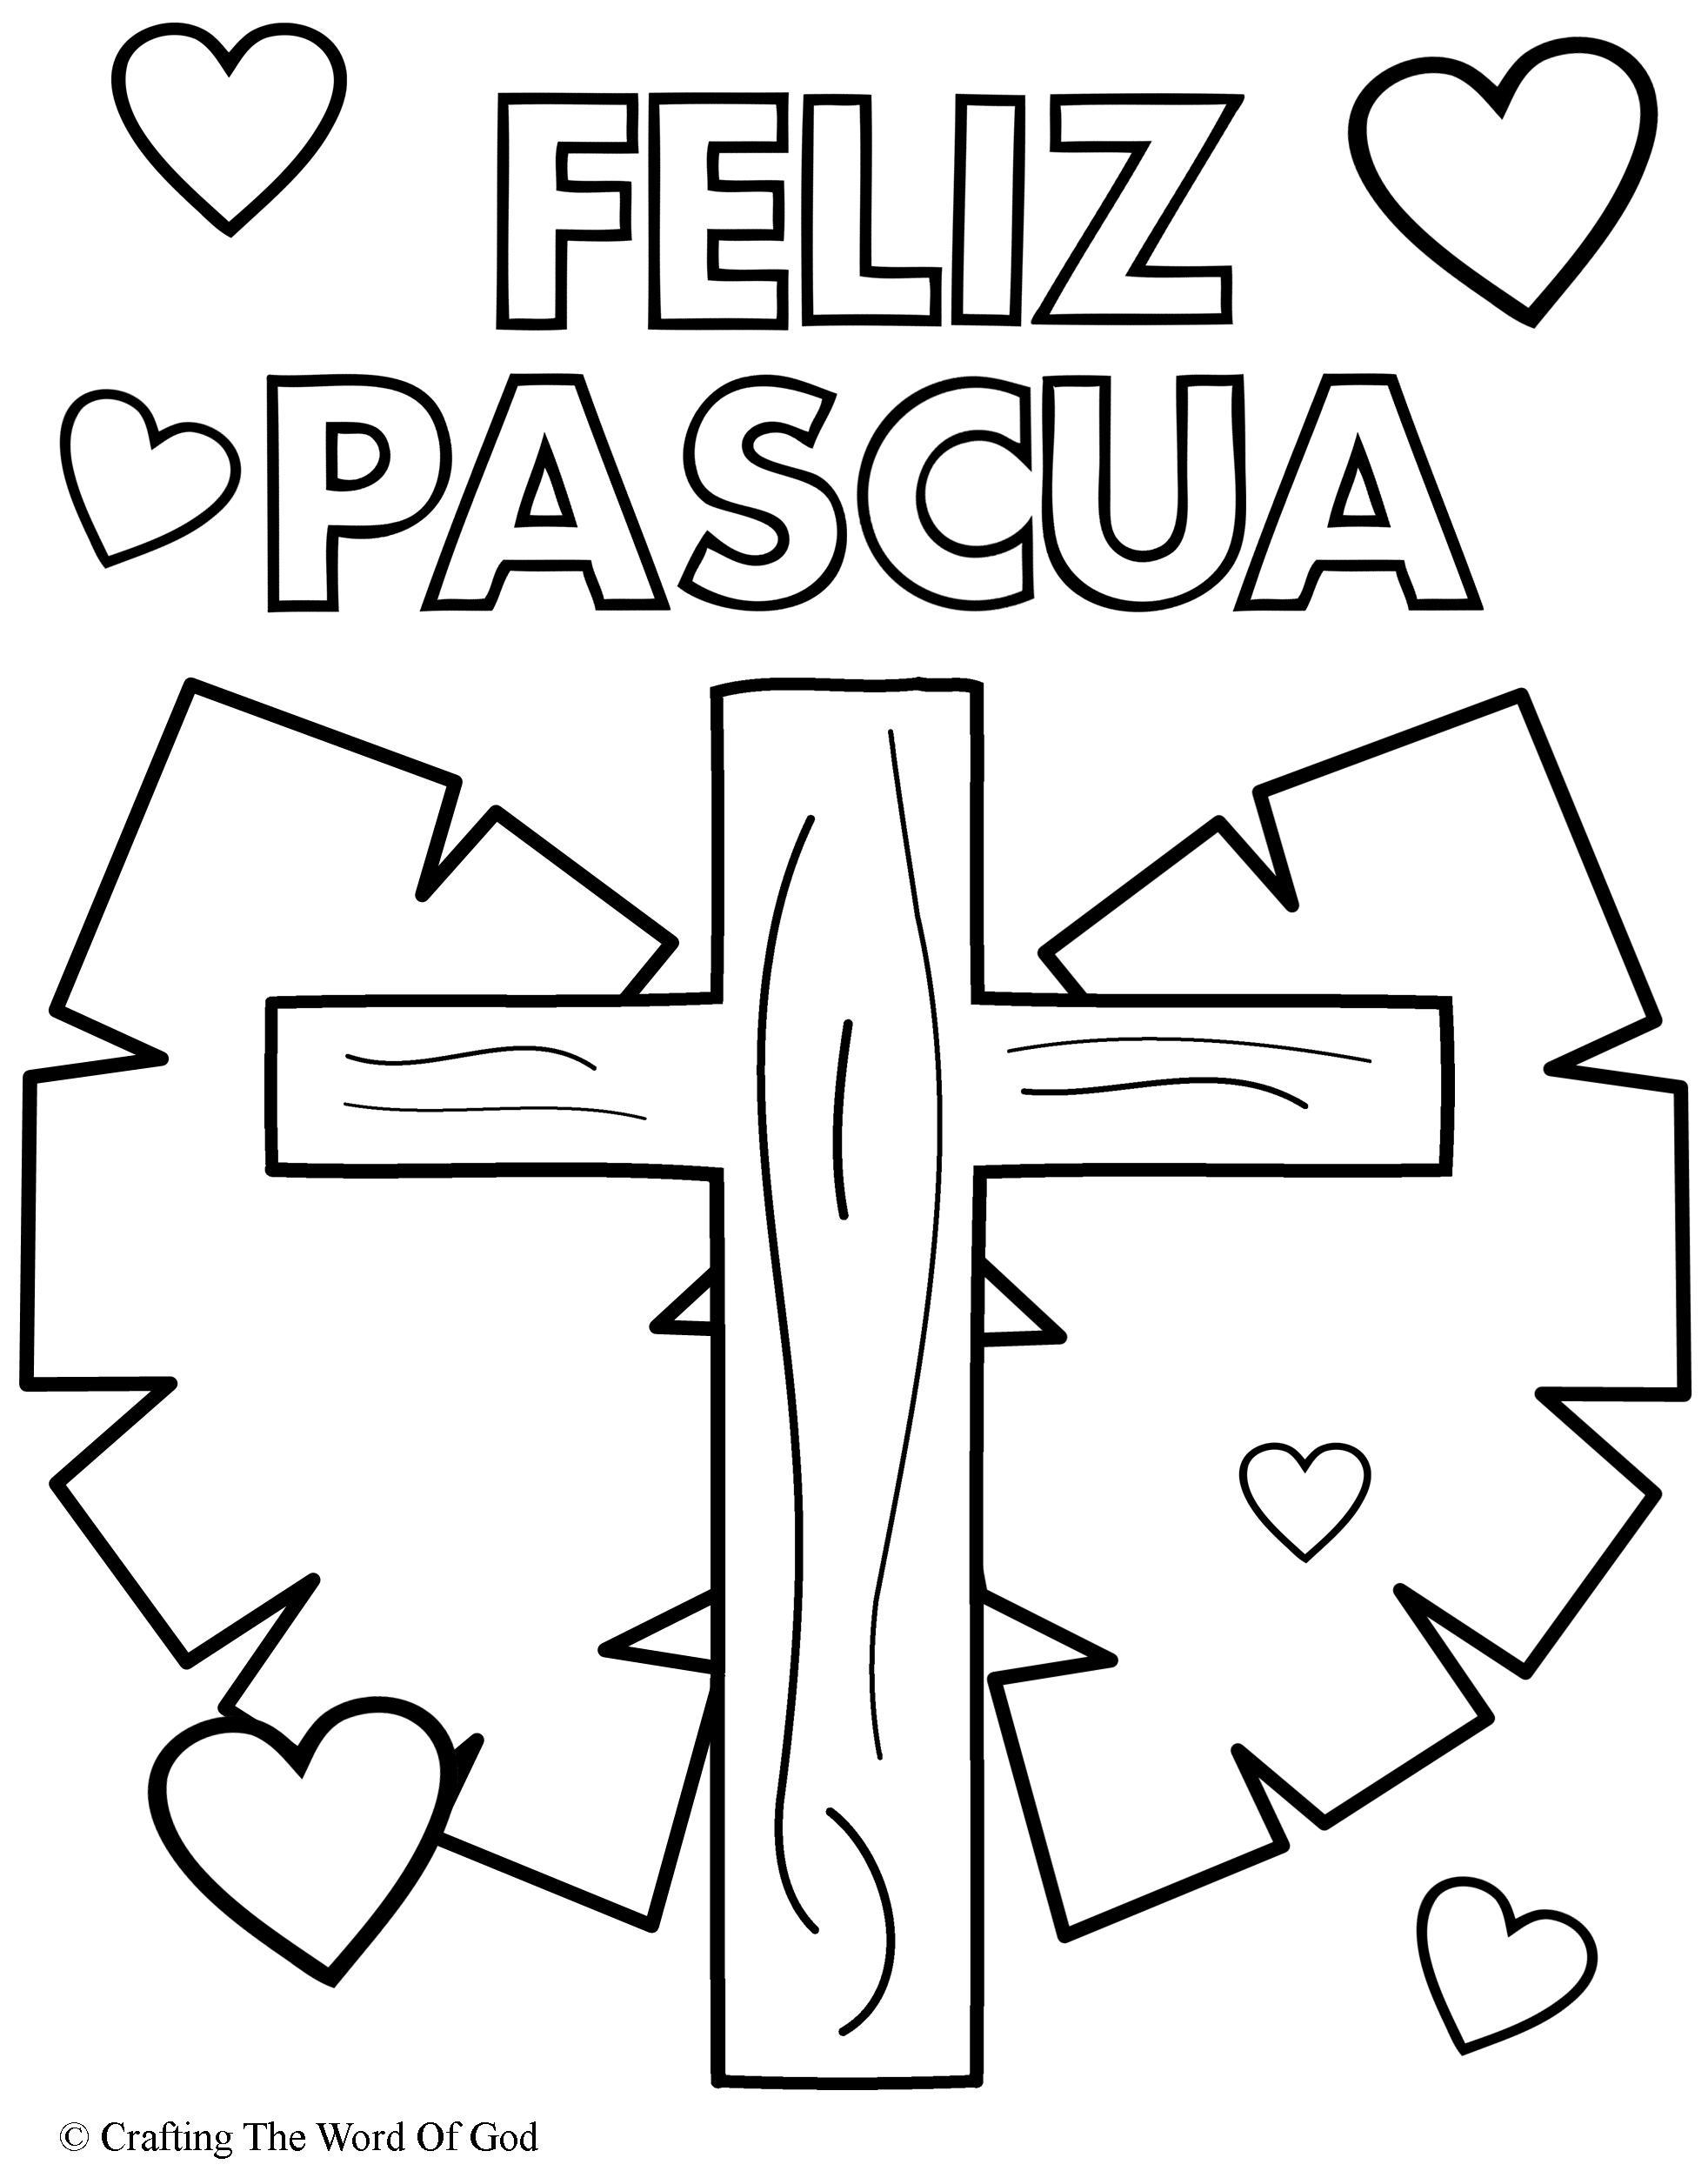 Feliz Pascua 3- Pagina De Colorear « Manualidades Biblicas